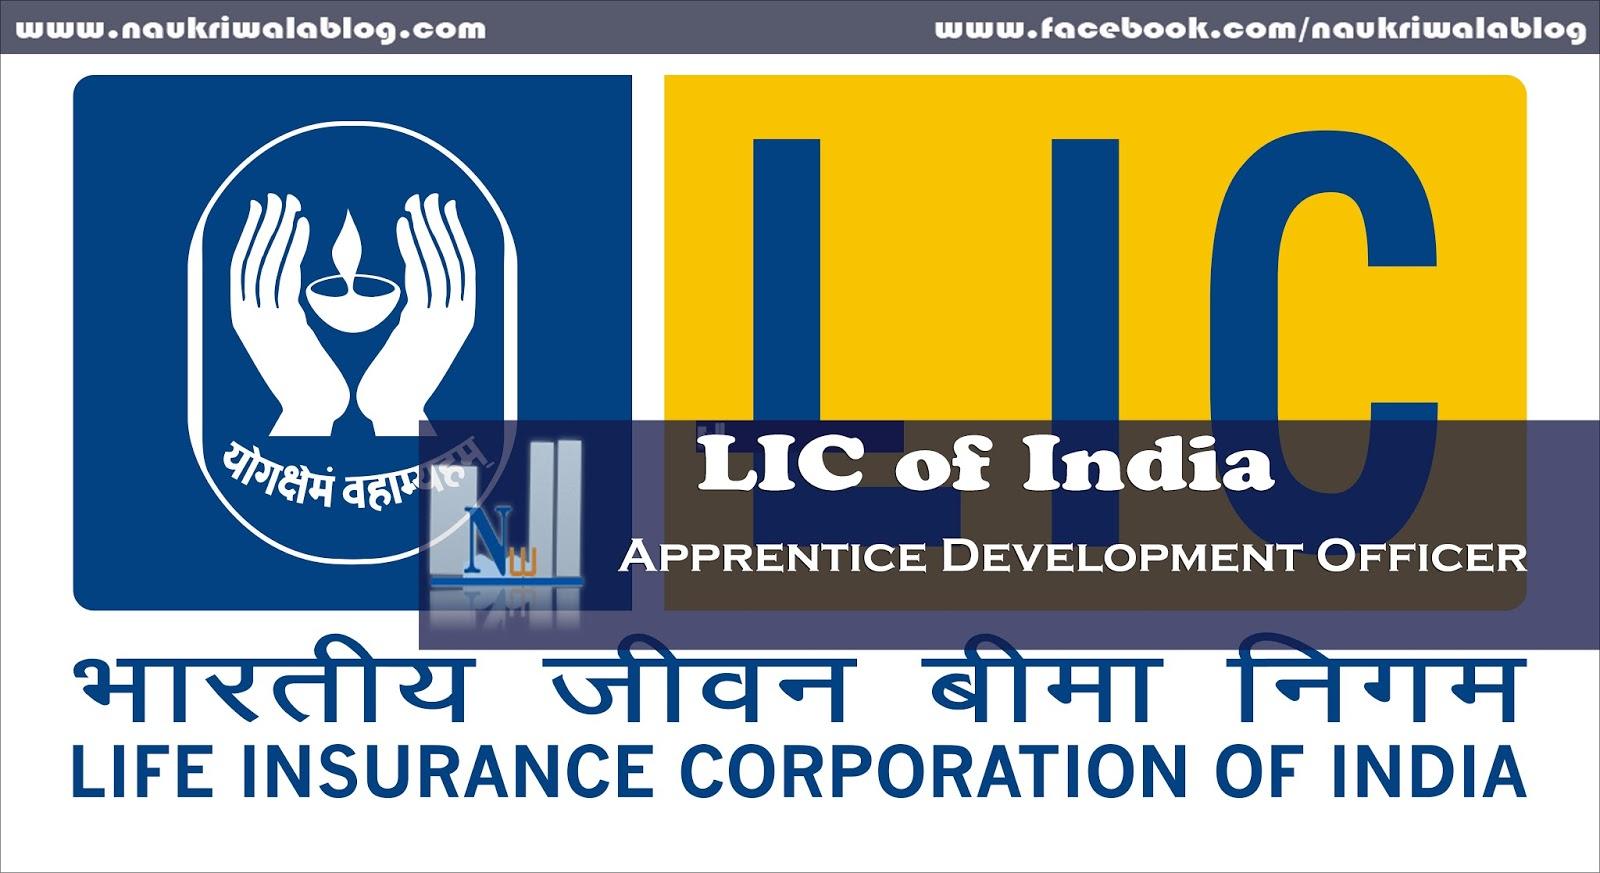 life insurance corporation of india Loading life insurance corporation of india loading.